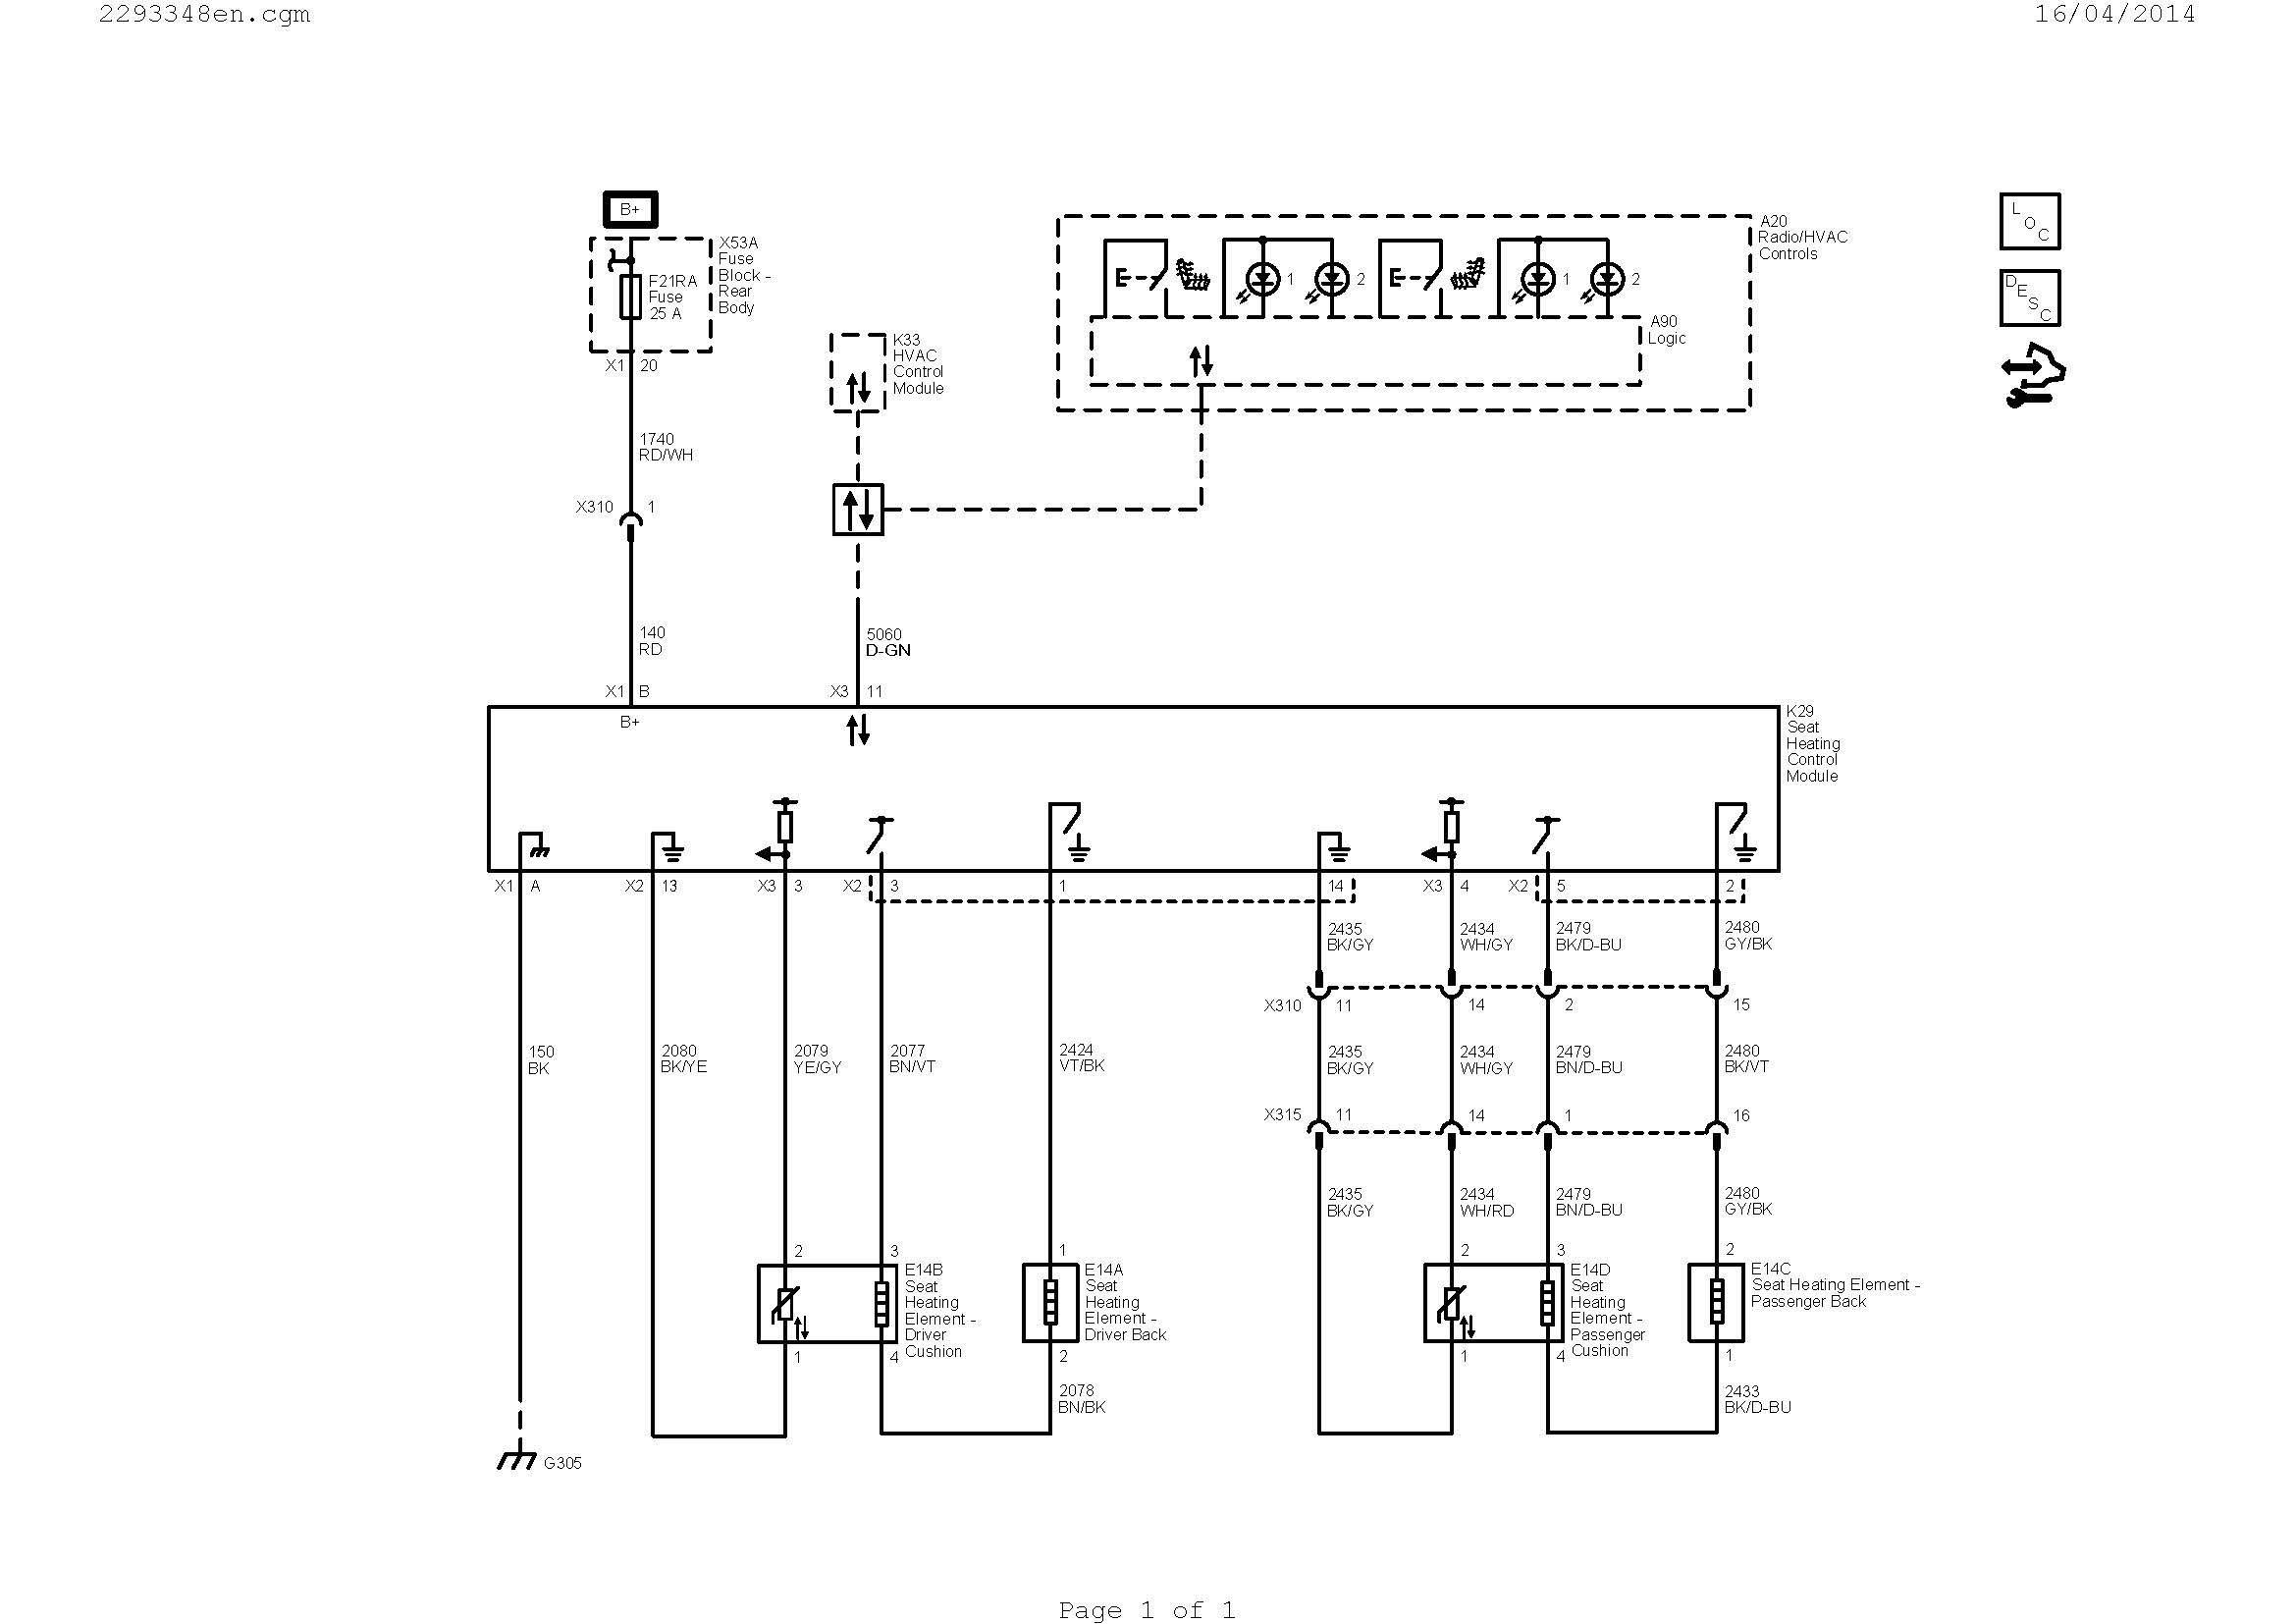 electric motor reversing switch wiring diagram Collection-Wiring Diagram for A Relay Switch Save Wiring Diagram Ac Valid Hvac Diagram Best Hvac Diagram 12-q